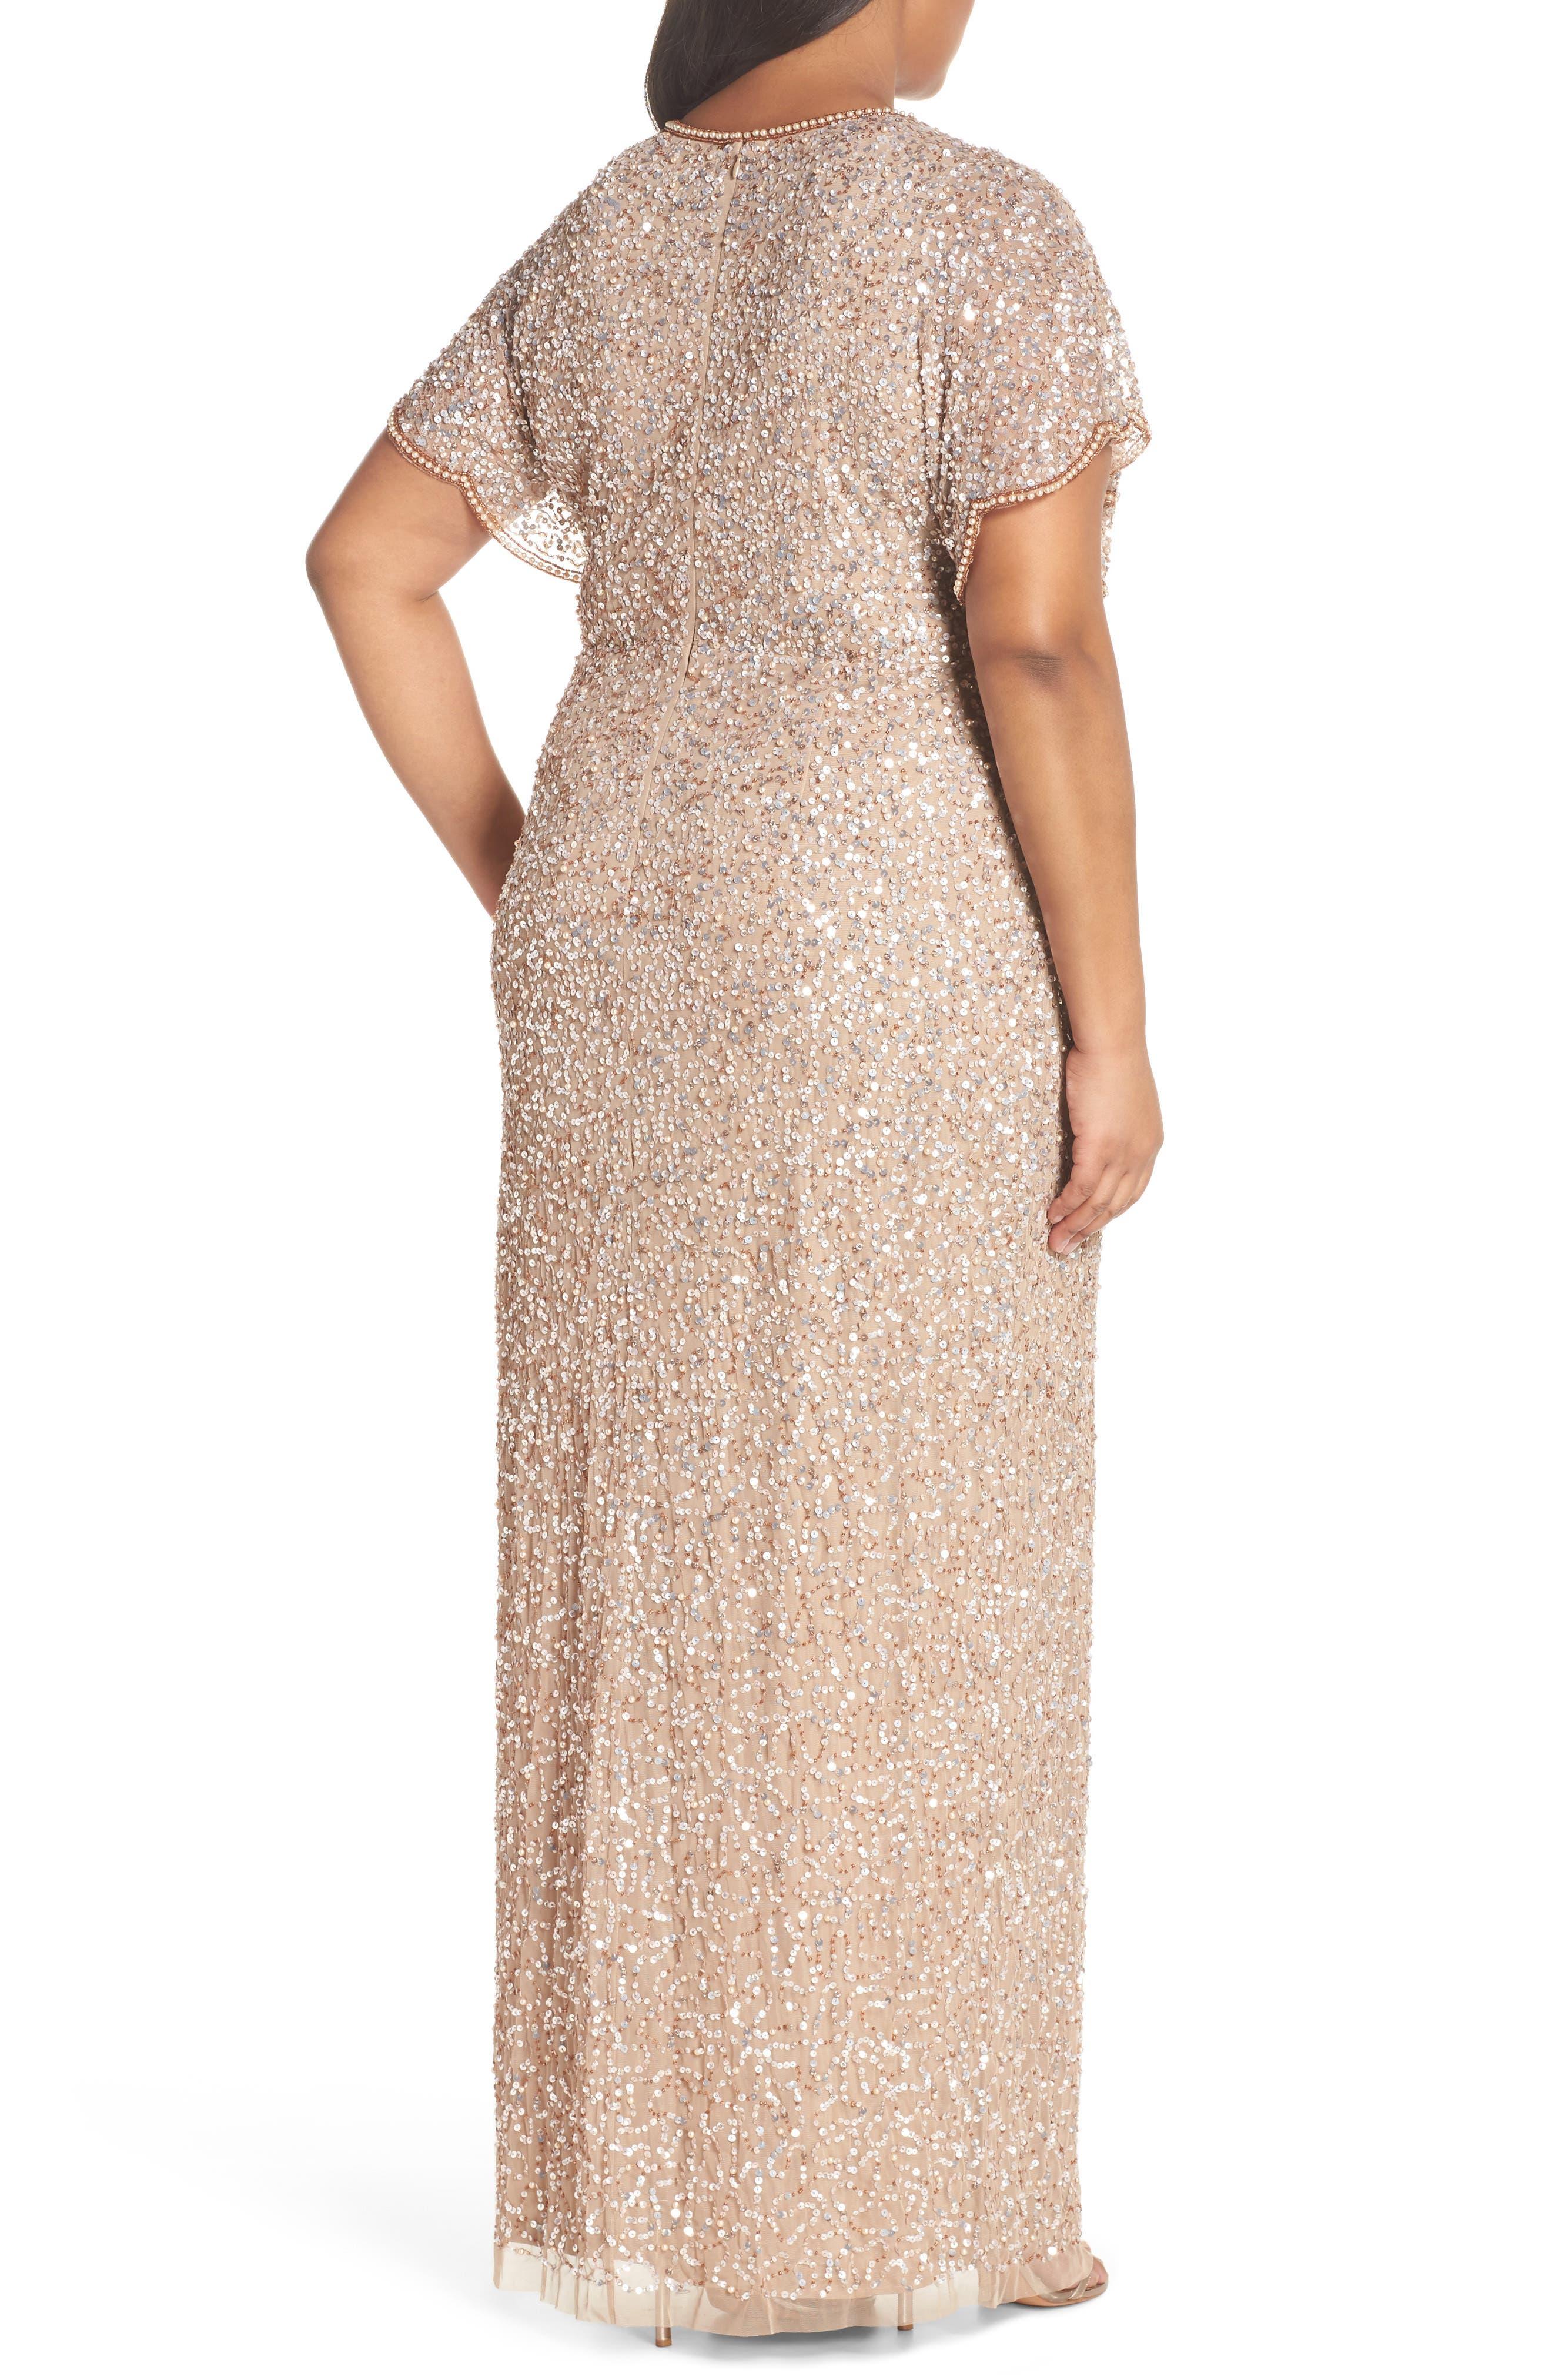 Flutter Sleeve Beaded Sequin Gown,                             Alternate thumbnail 2, color,                             710